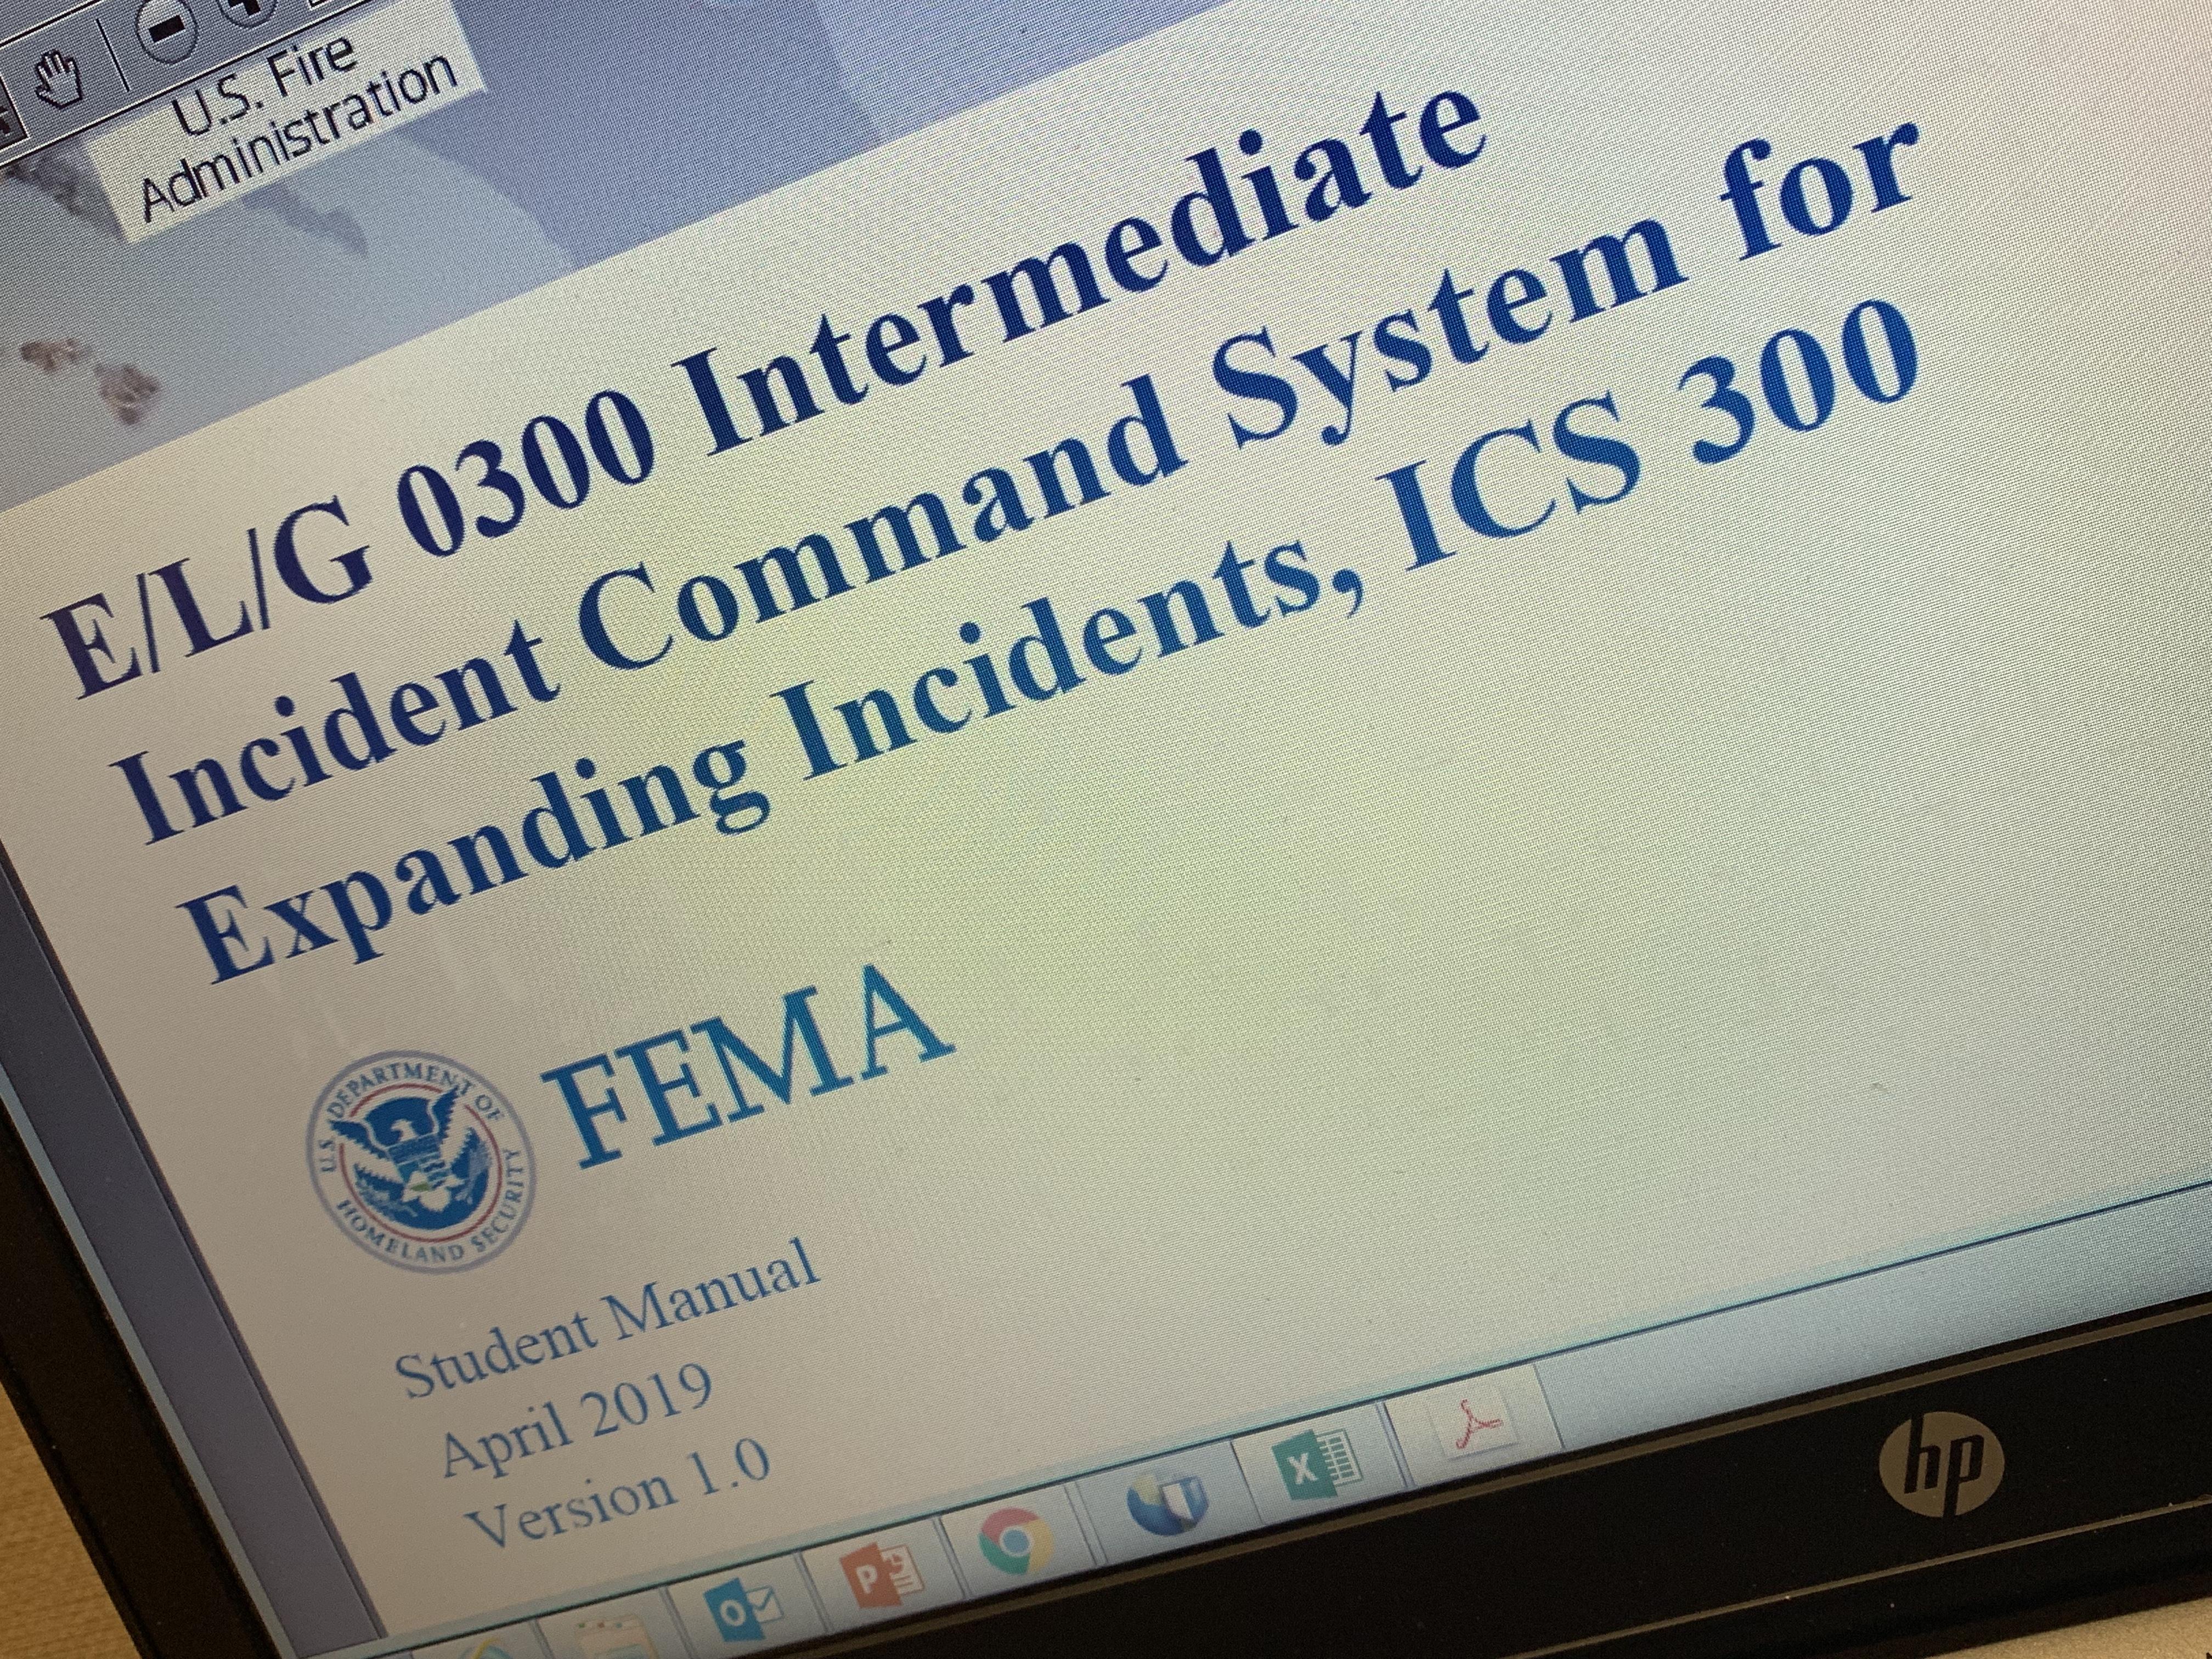 New ICS 300 and ICS 400 debut tomorrow | Where is @rusnivek?